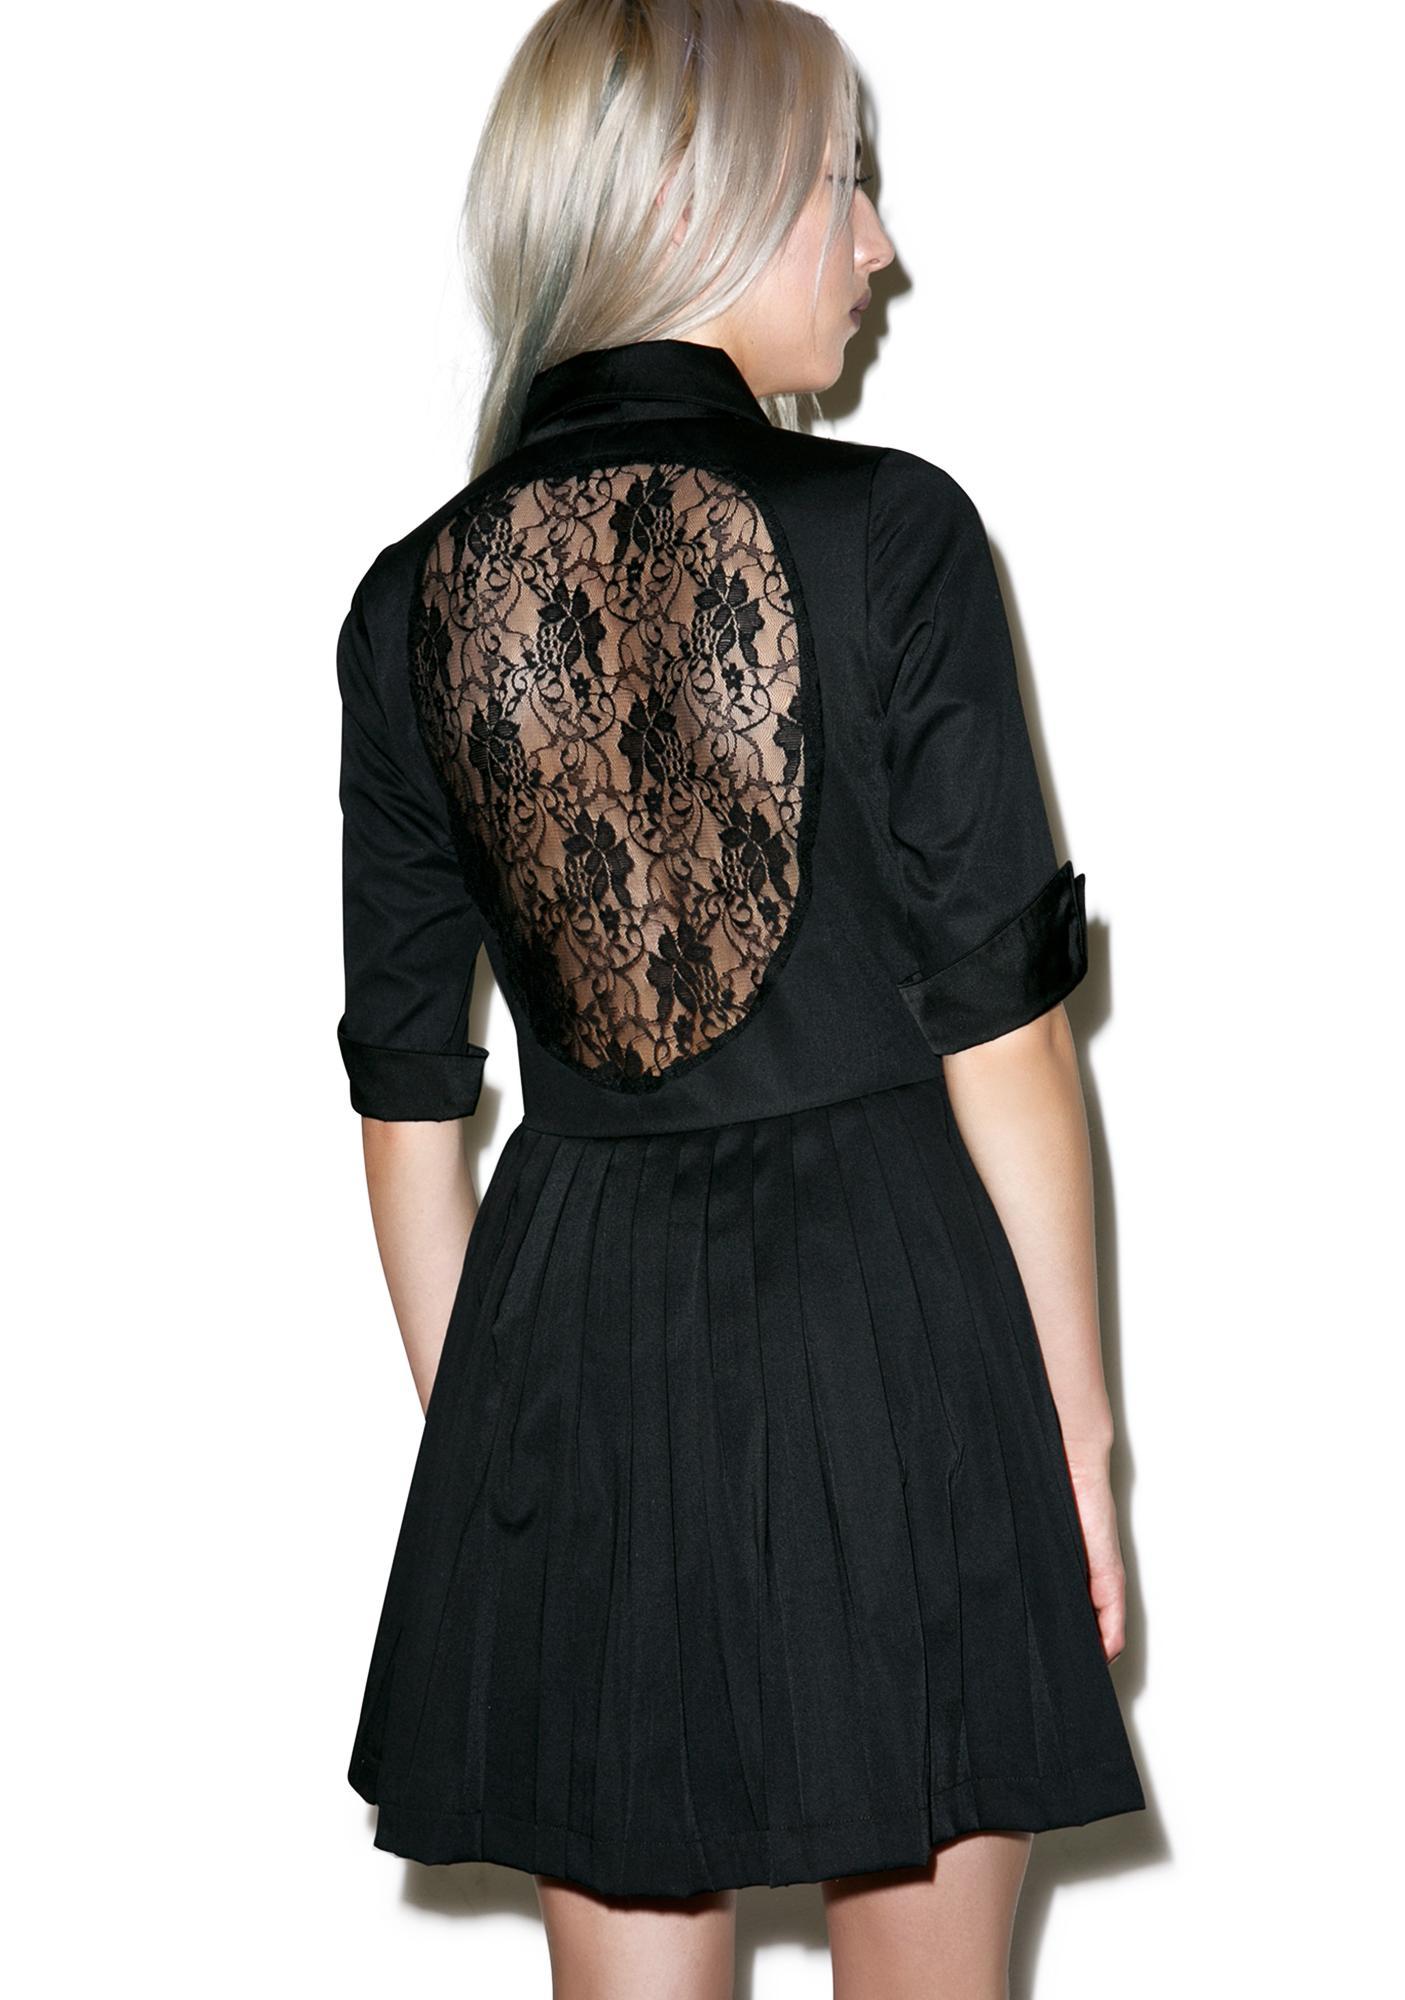 Iron black dress